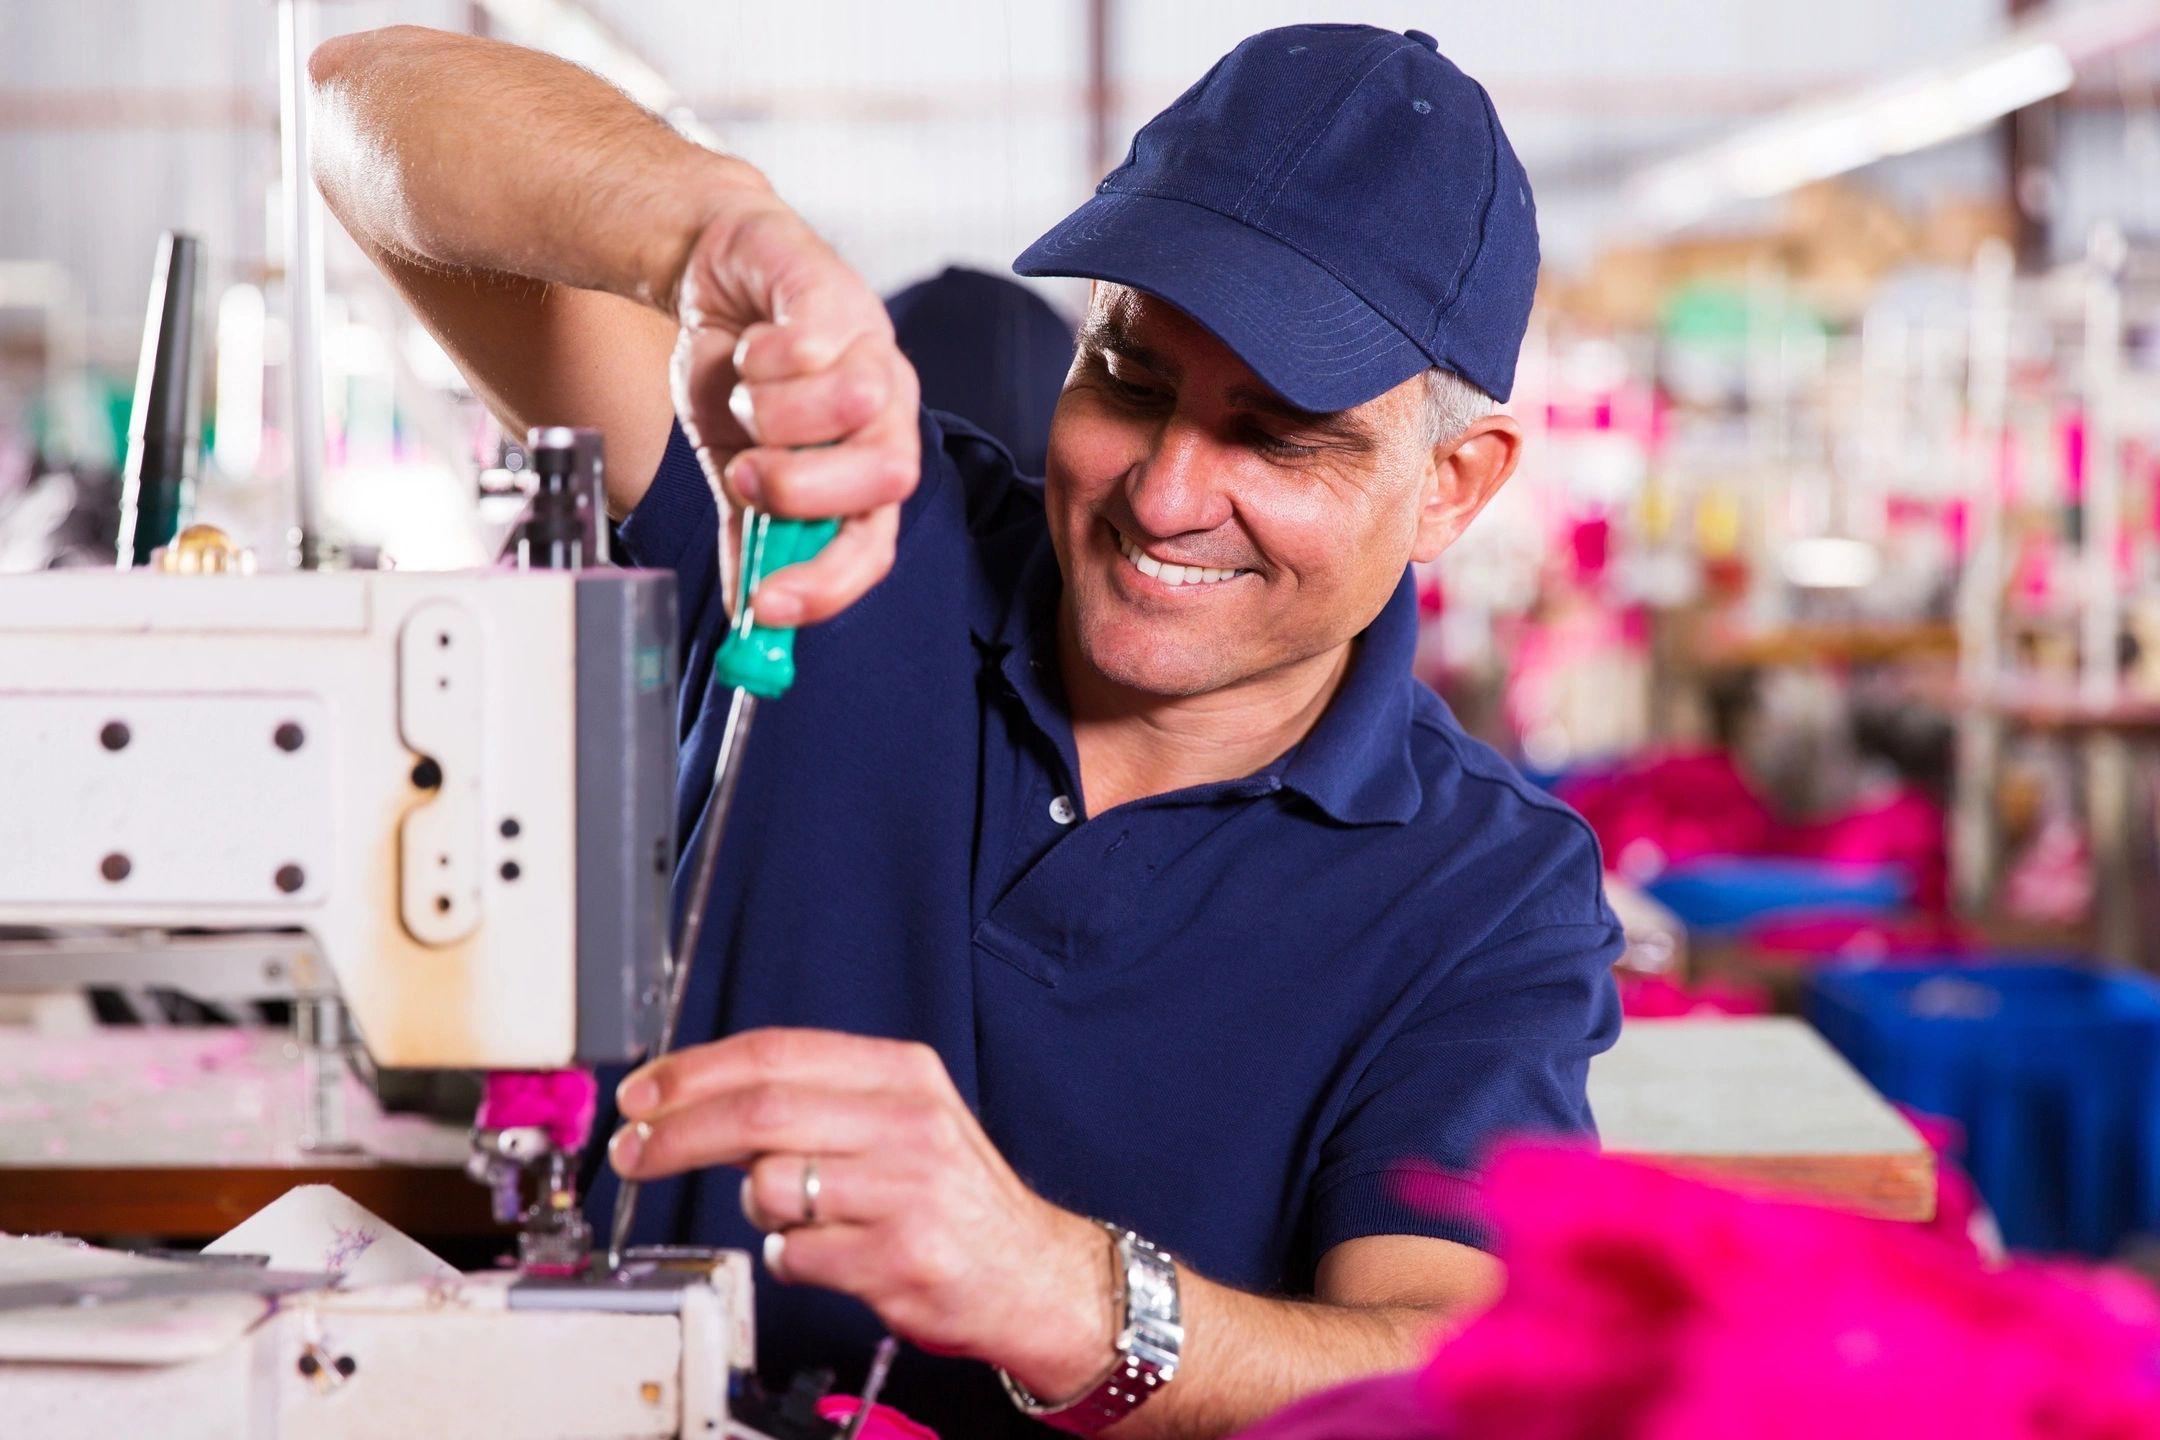 repair clinic, sewing machine repair, small appliance repair